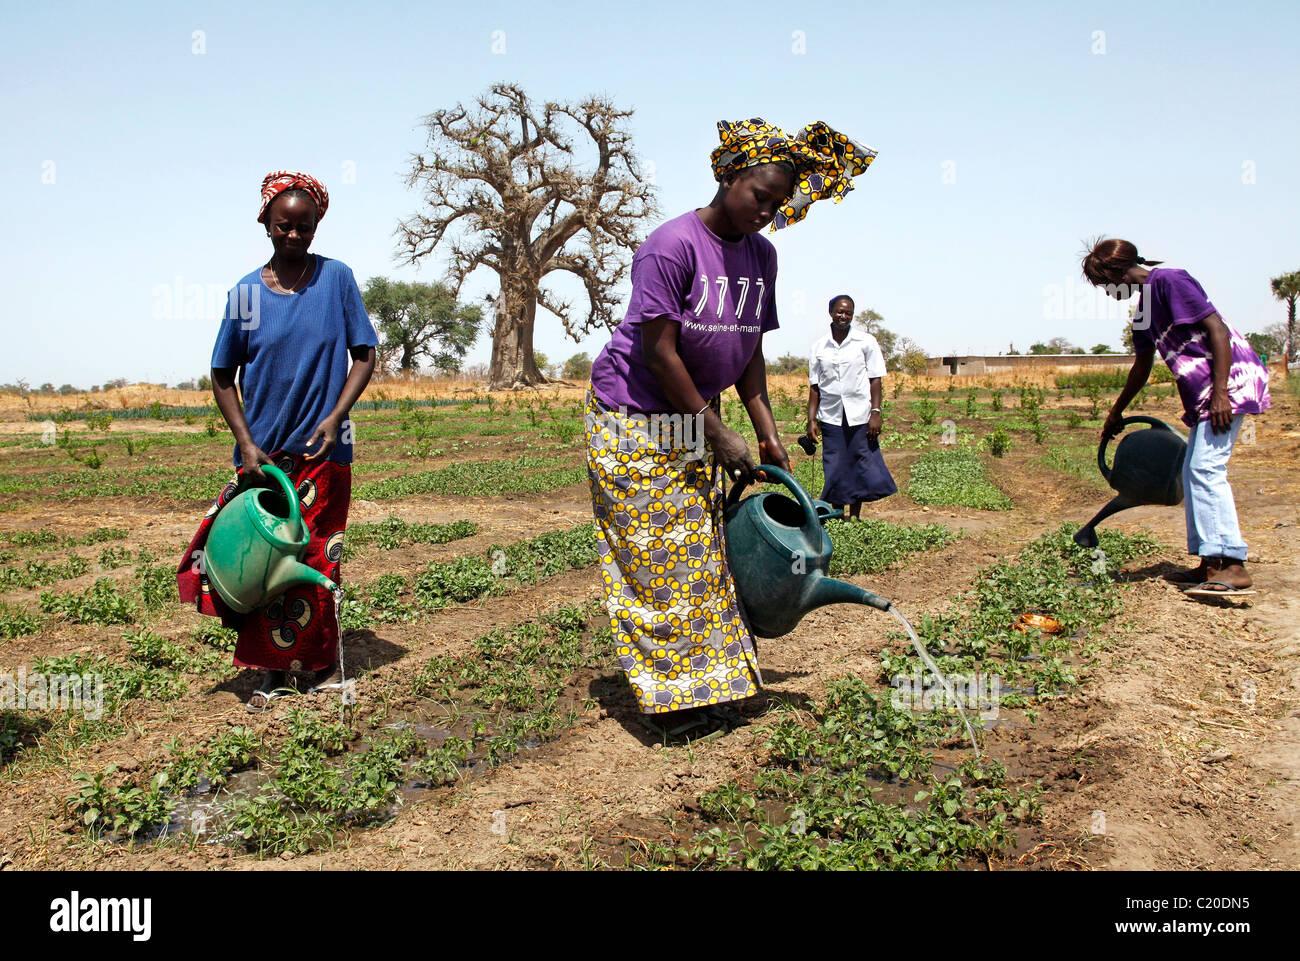 Women working in their vegetable garden, Senegal - Stock Image